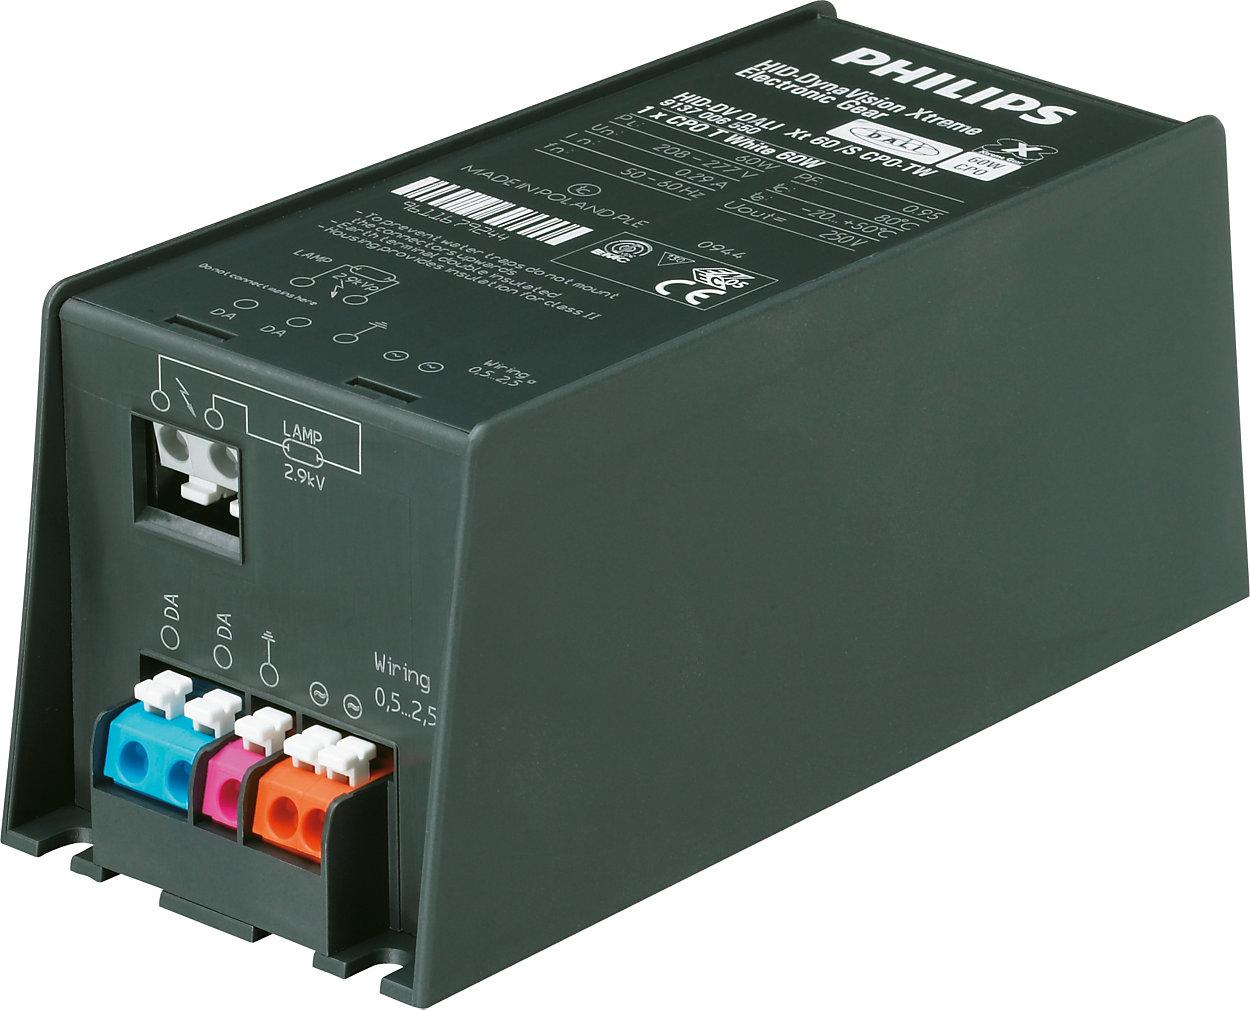 Xtreme-driver för maximal energibesparing